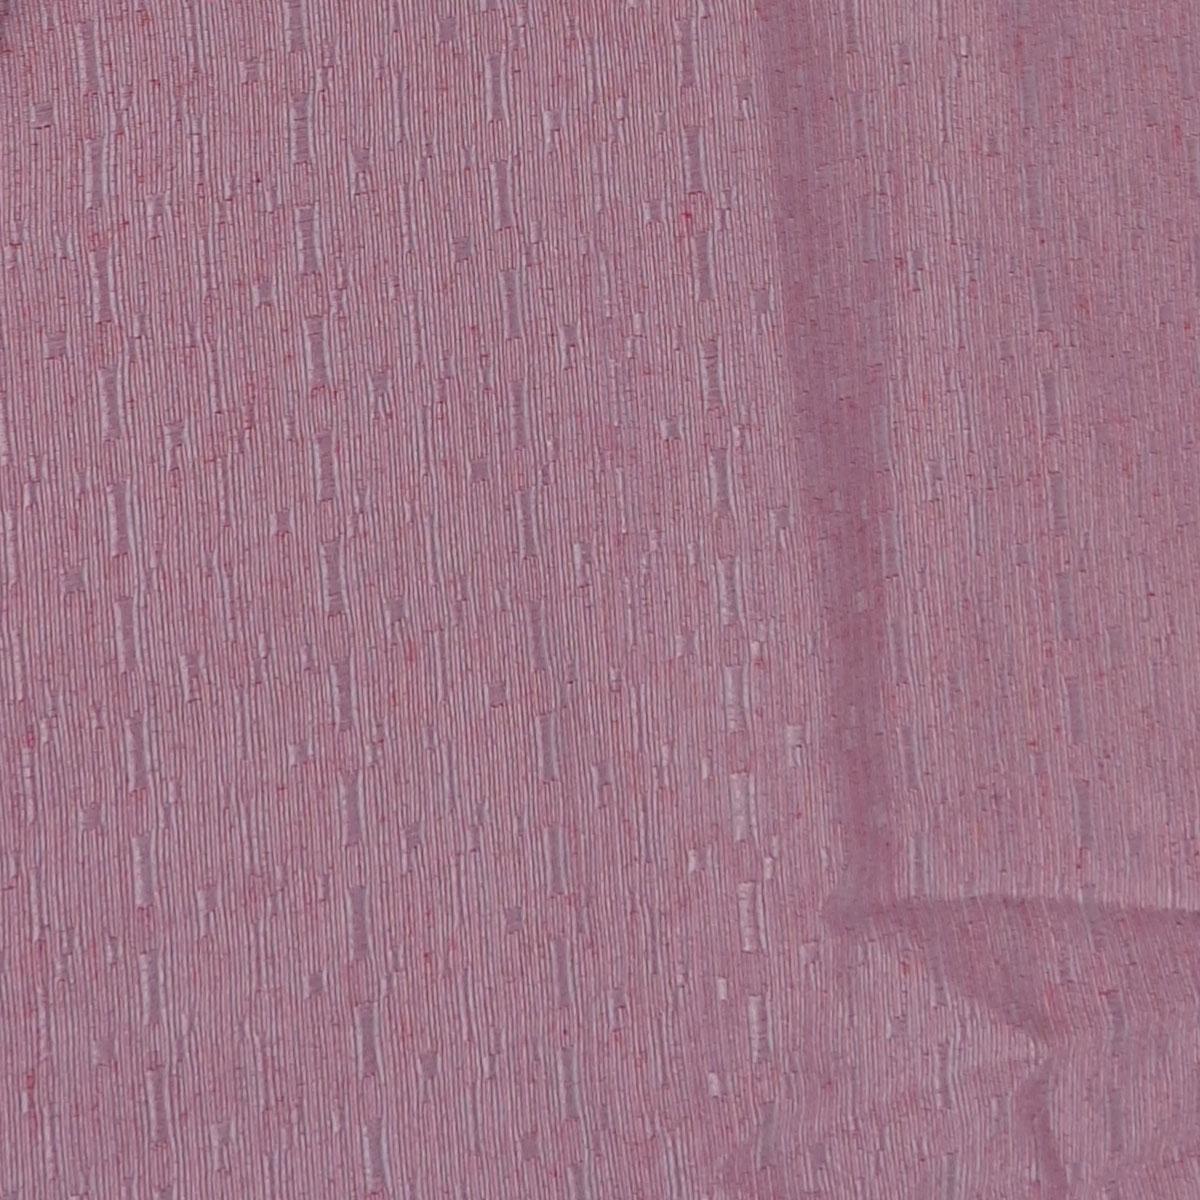 Cortina Para Sala Rústica Muralle Vermelho 2,60 x 1,70 Bella Janela